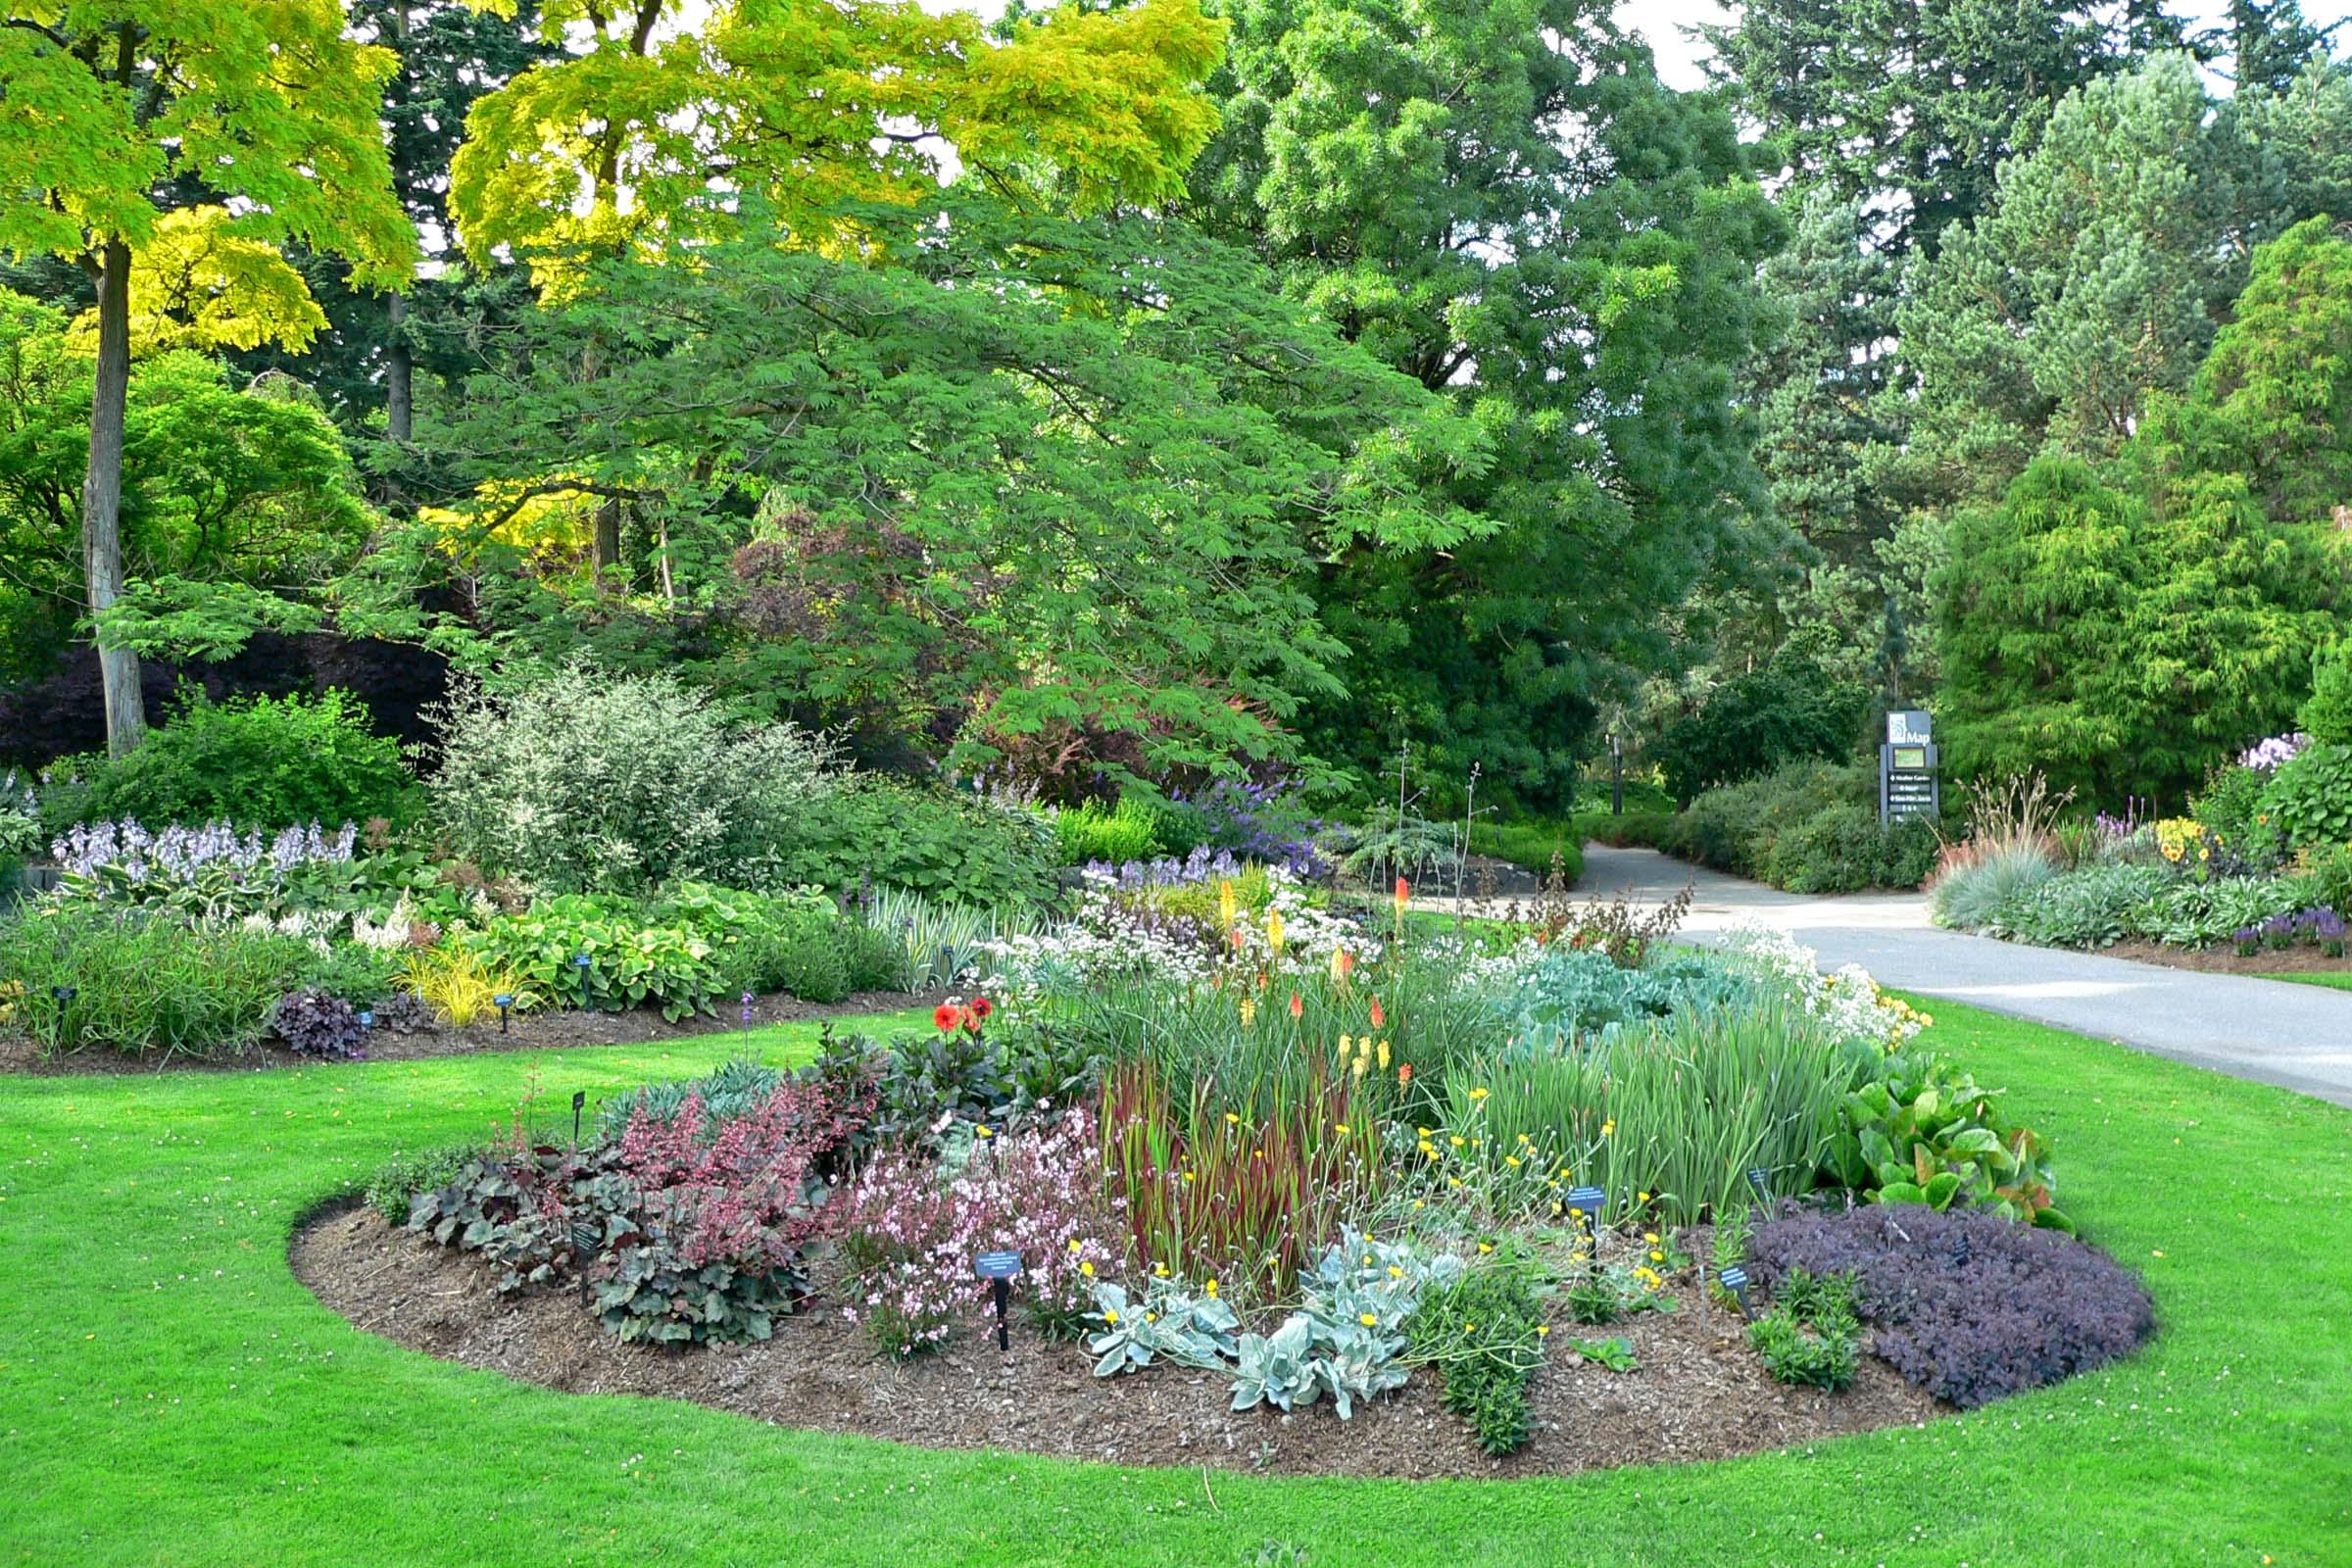 Botanical Garden Vancouver Vandusen Botanical Gardens Vancouver Canada Pixdaus File Vandusen